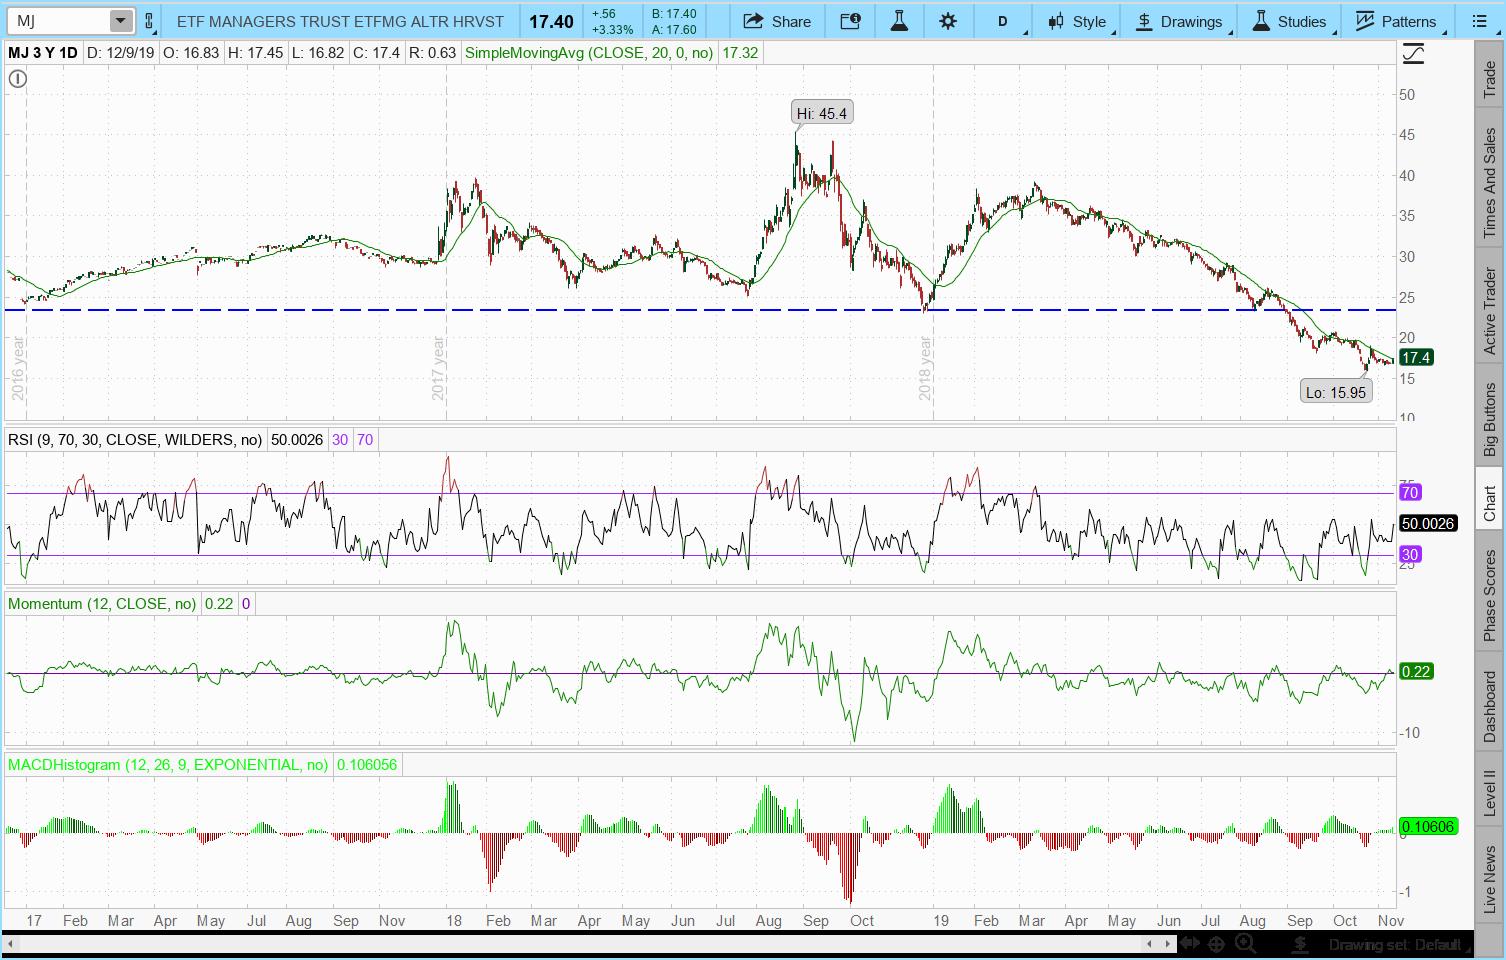 MJ ETF Stock chart: best etfs 2020